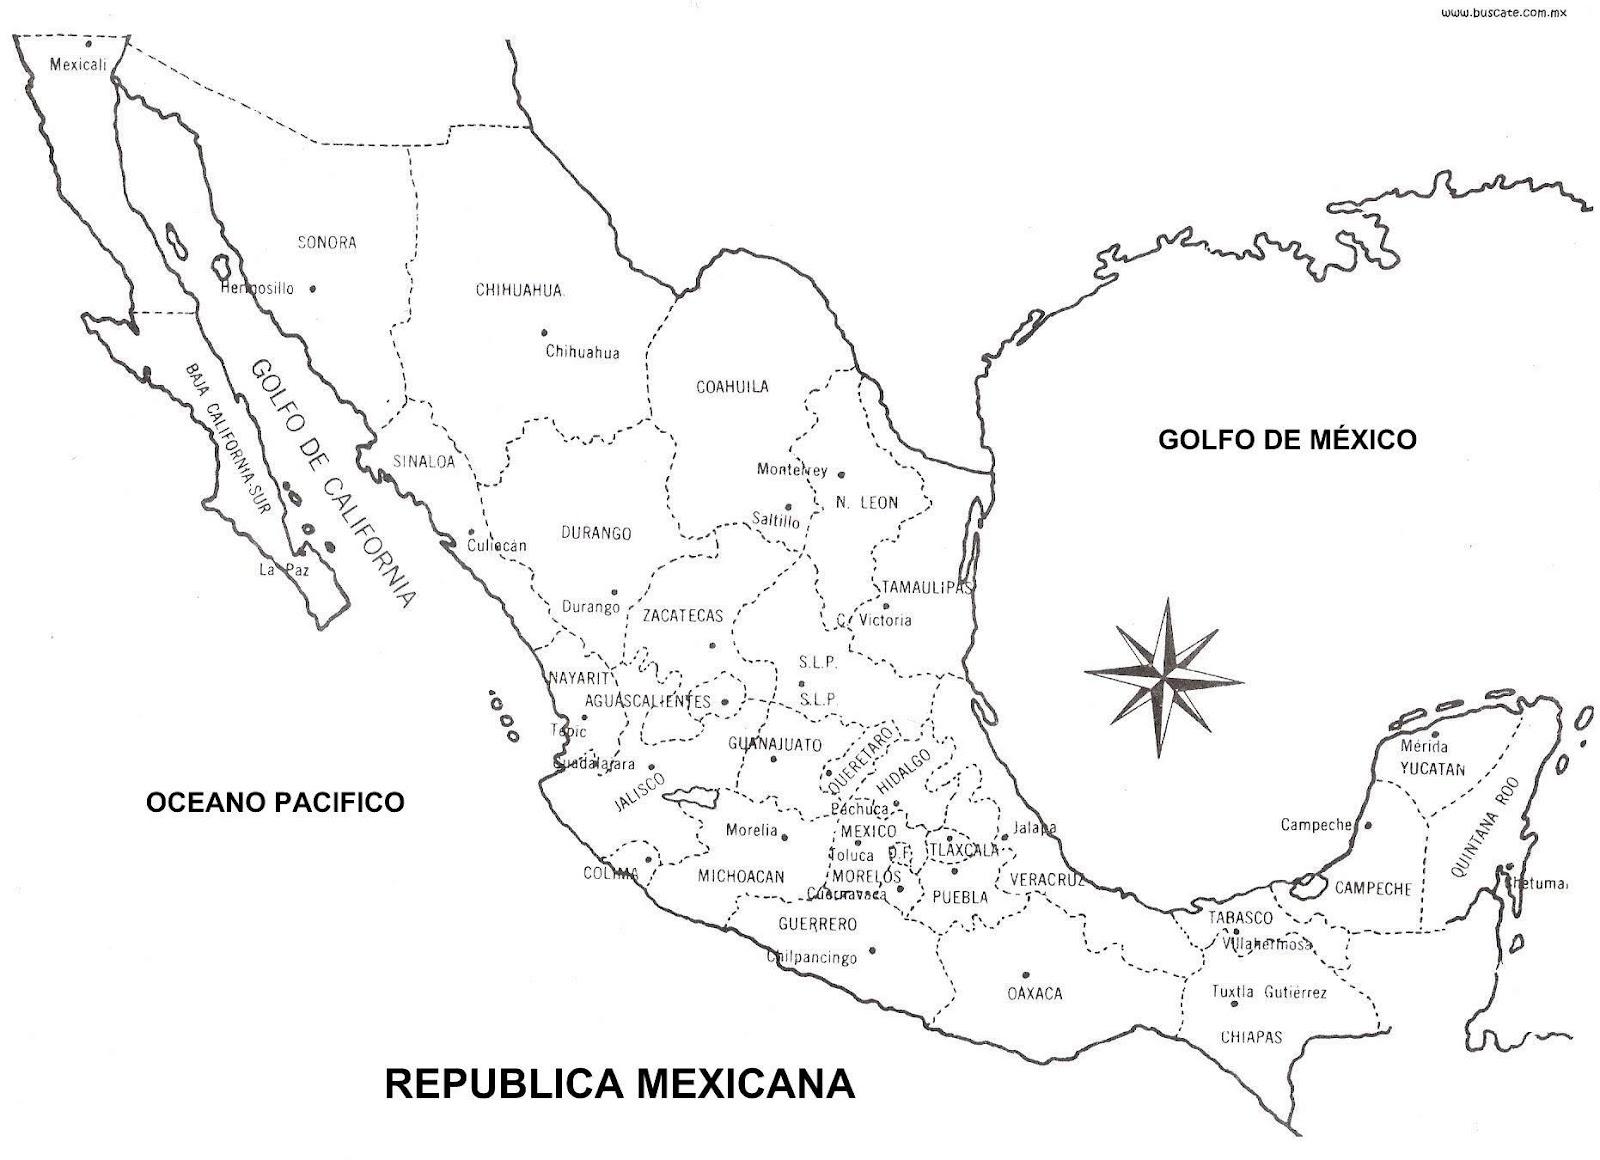 mapa-de-mexico-con-nombres-Mapa_Mex